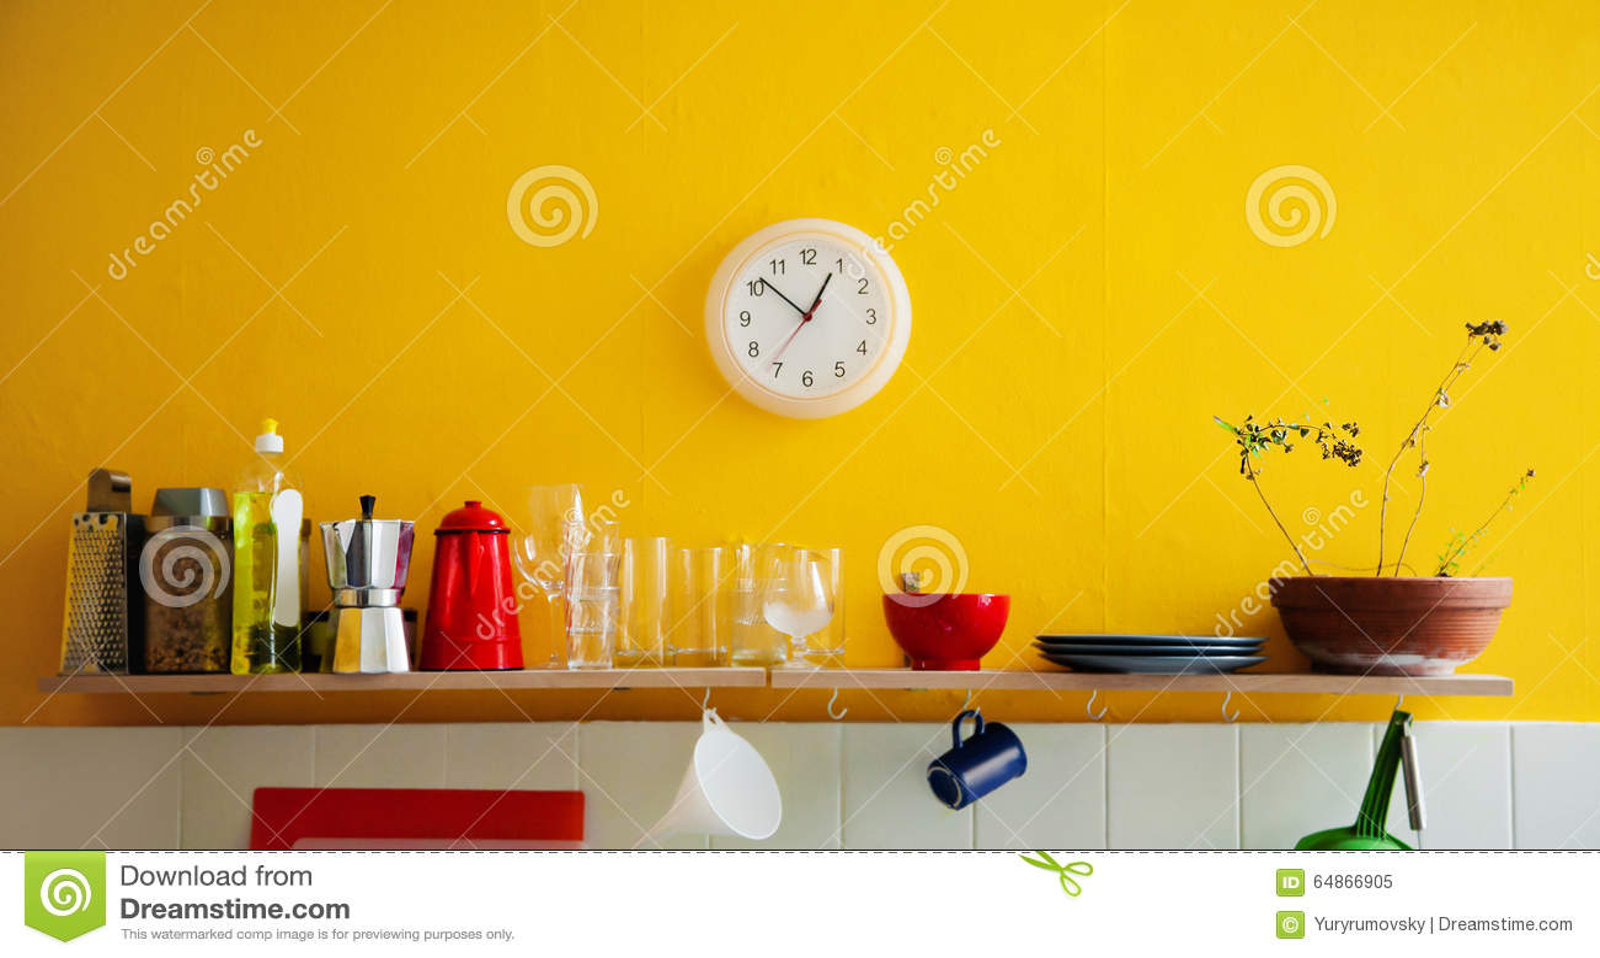 Horloge Murale Jaune Dans La Cuisine Photo stock - Image: 64866905